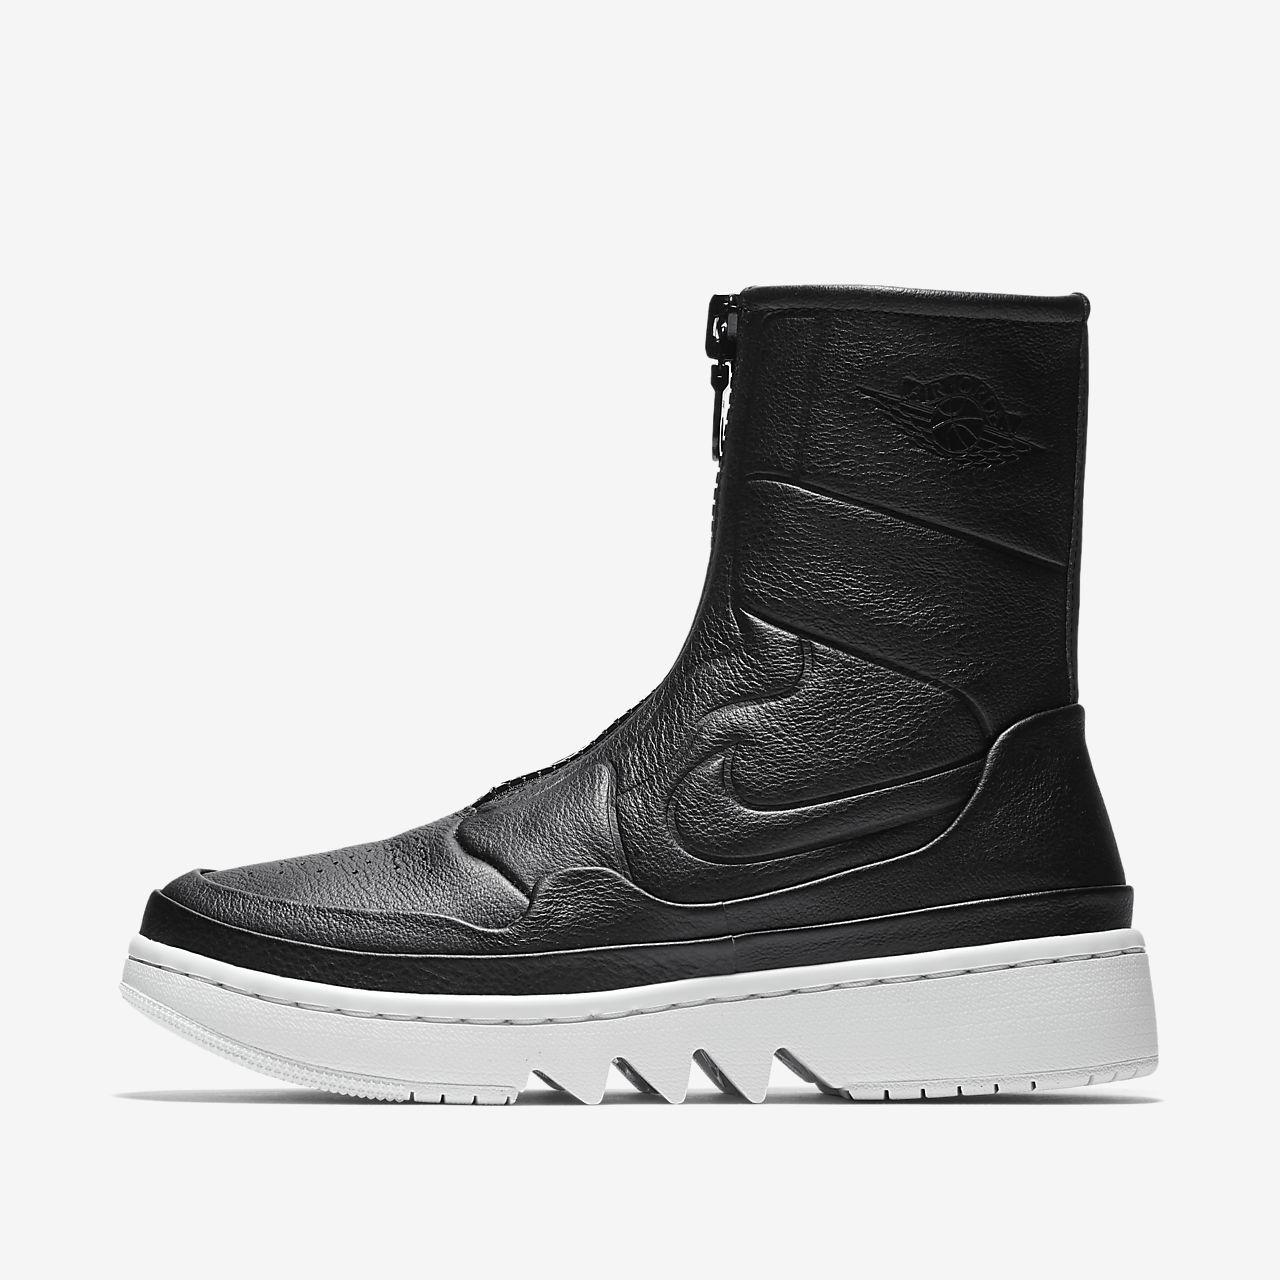 d201ba0cb90d Air Jordan 1 Jester XX Women s Shoe. Nike.com GB